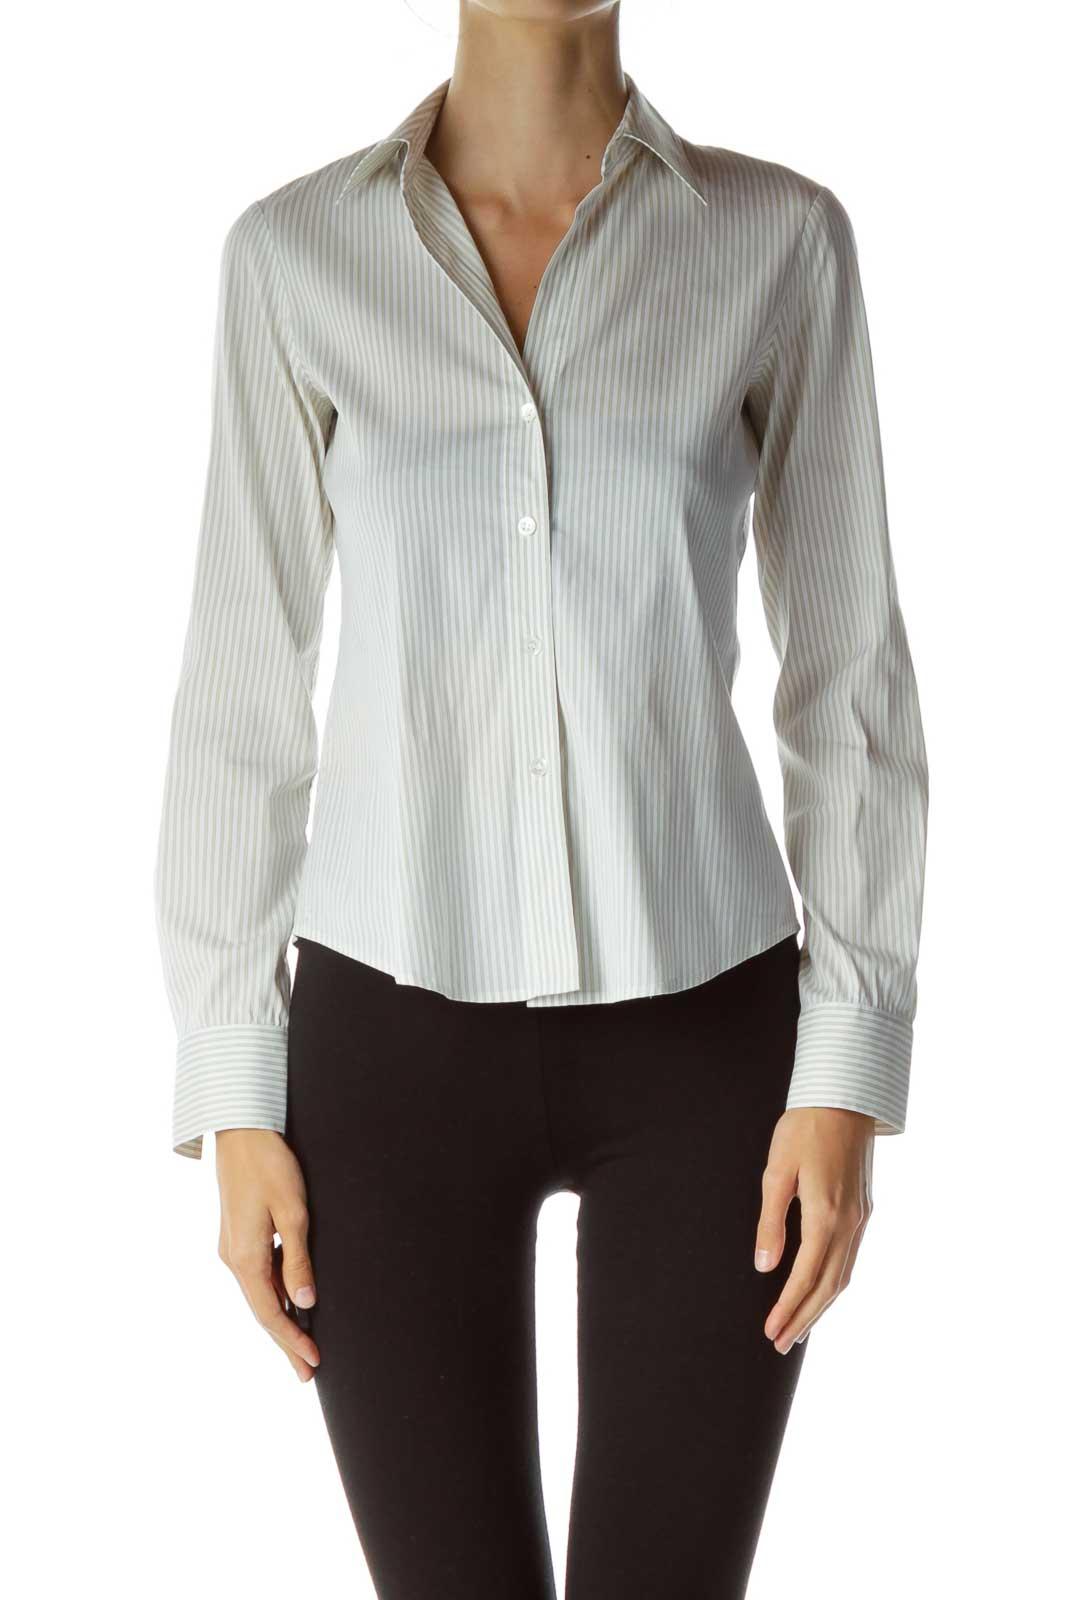 Green White Pinstripe Shirt Front